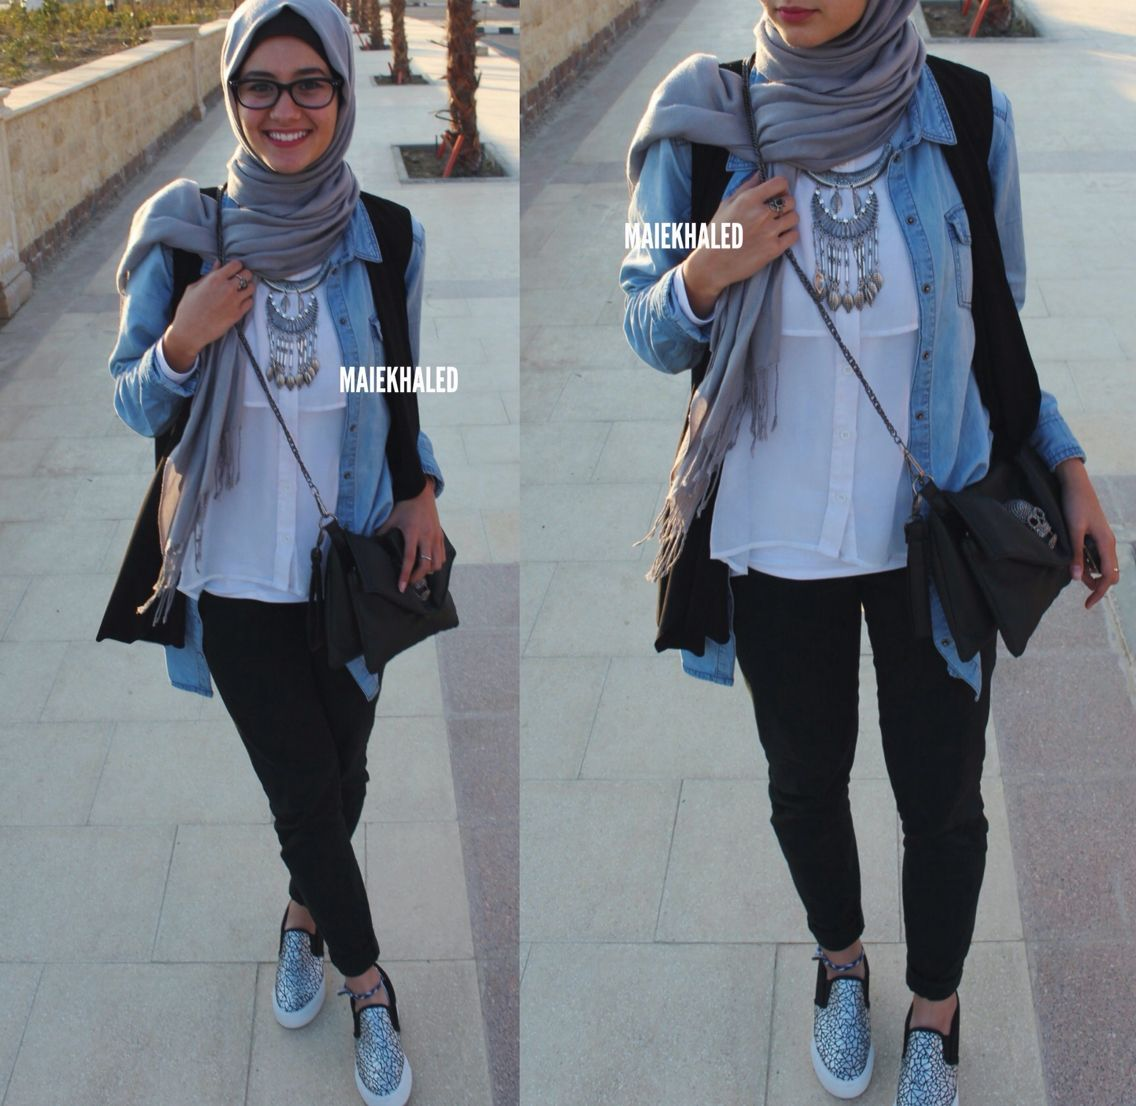 Hijab Outfit Black Pants And Jeans Jacket Hijab Fashion Pinterest Hijab Outfit Nice And